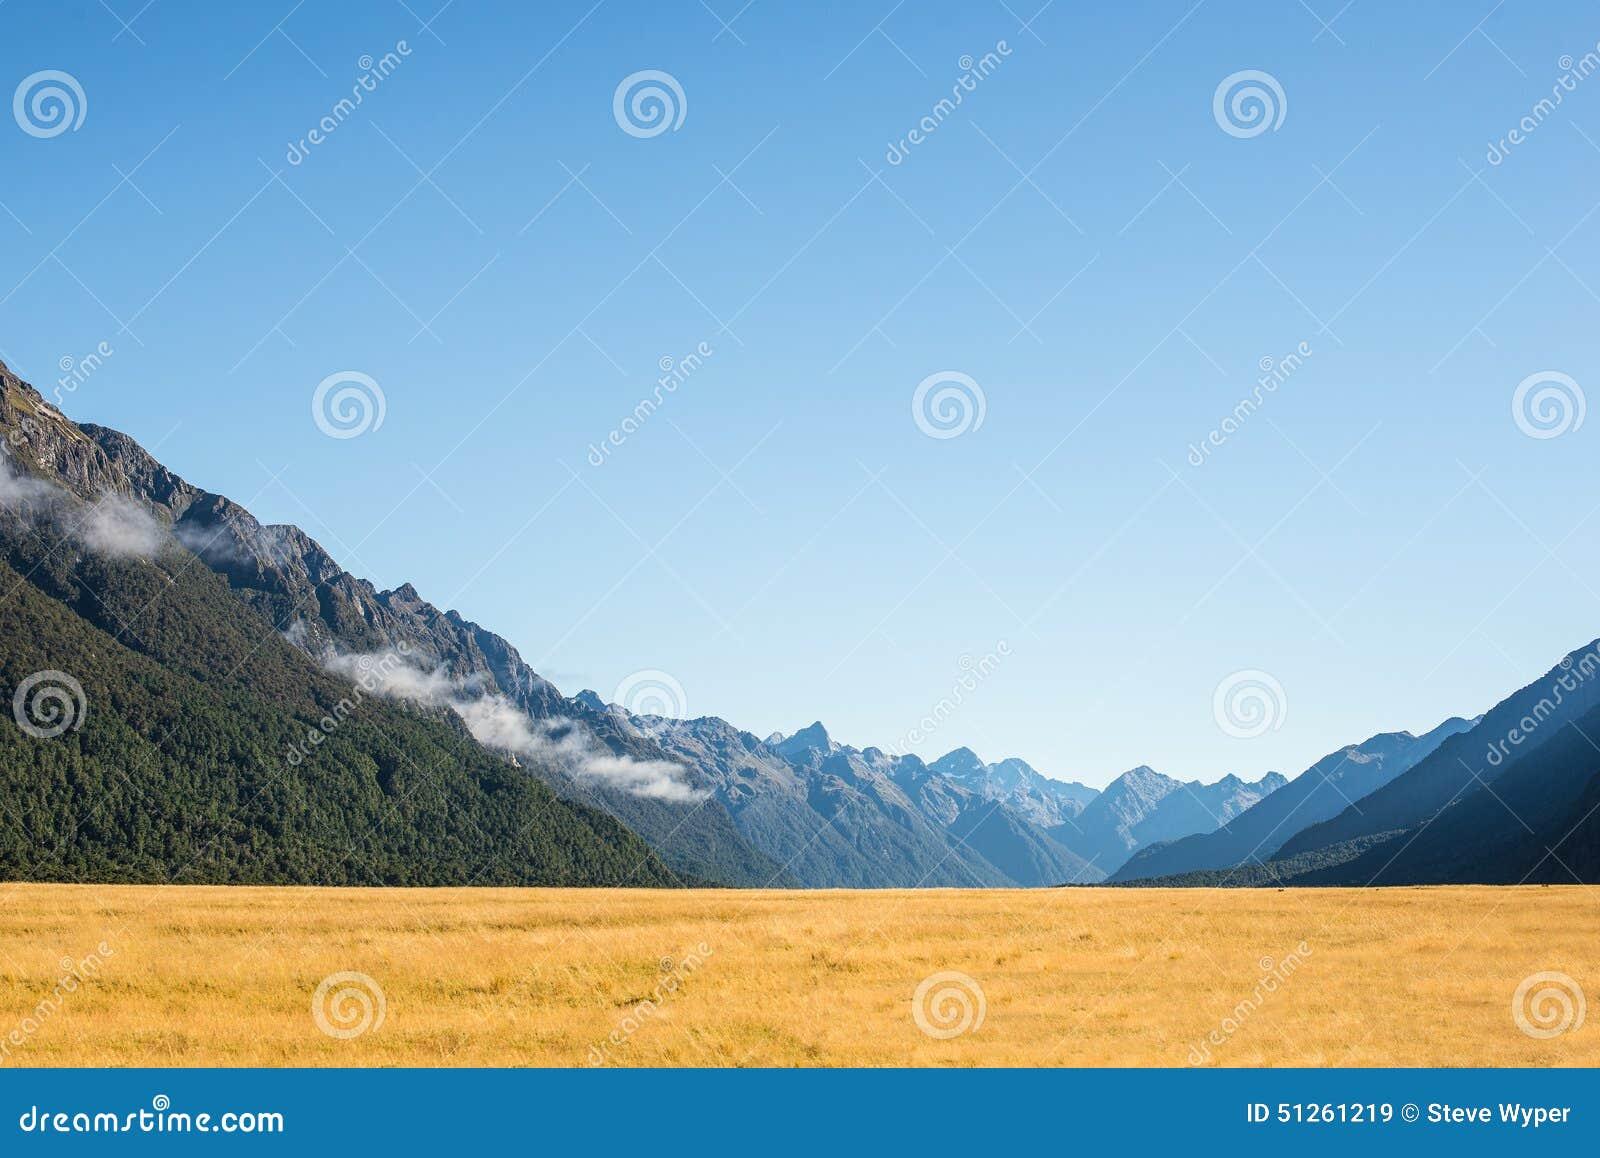 Mountain Range In New Zealand Stock Photo Image 51261219